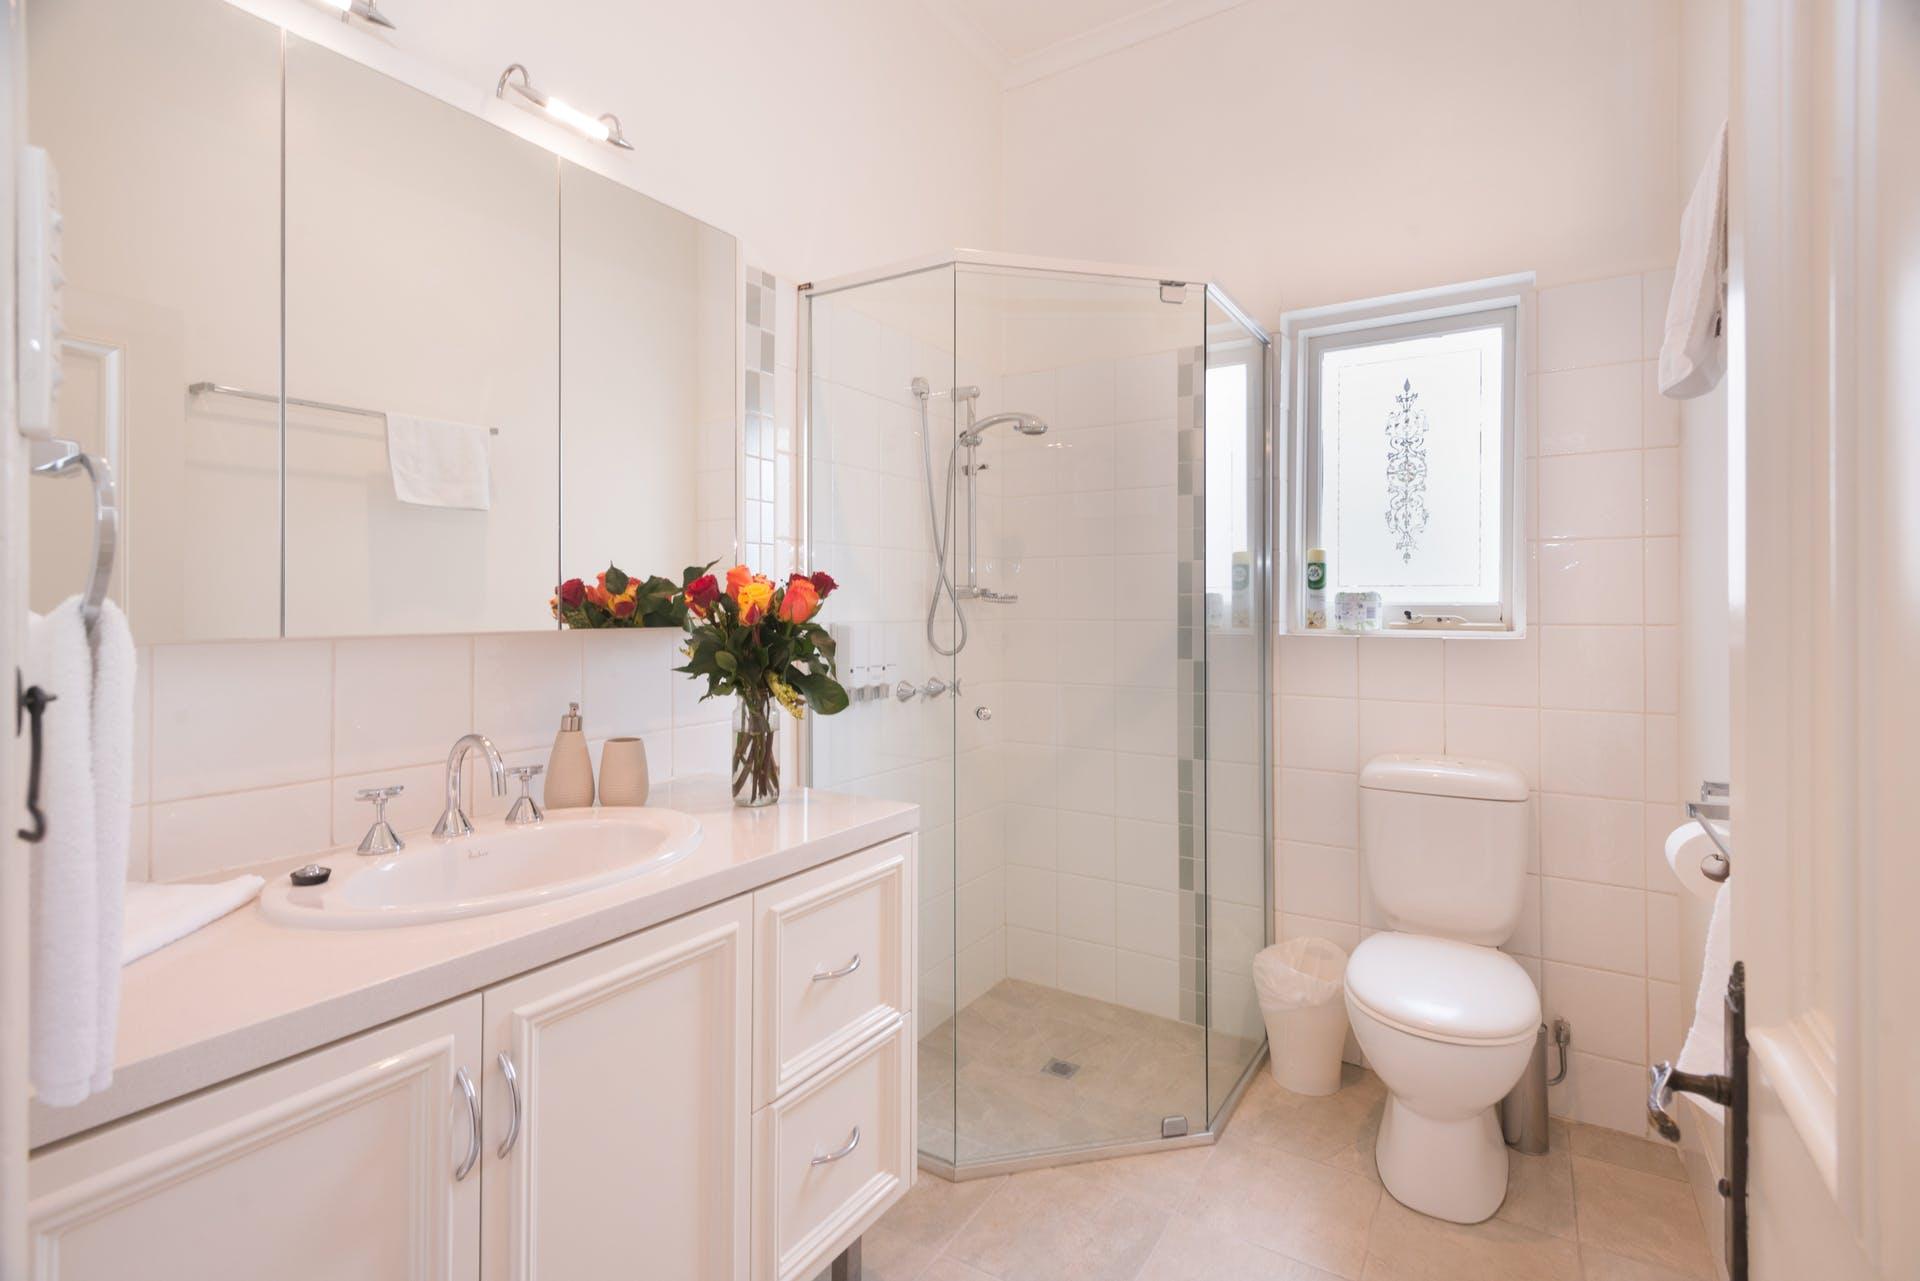 601-king-street-west-melbourne-student-accommodation-Melbourne-bathroom-1-Unilodgers